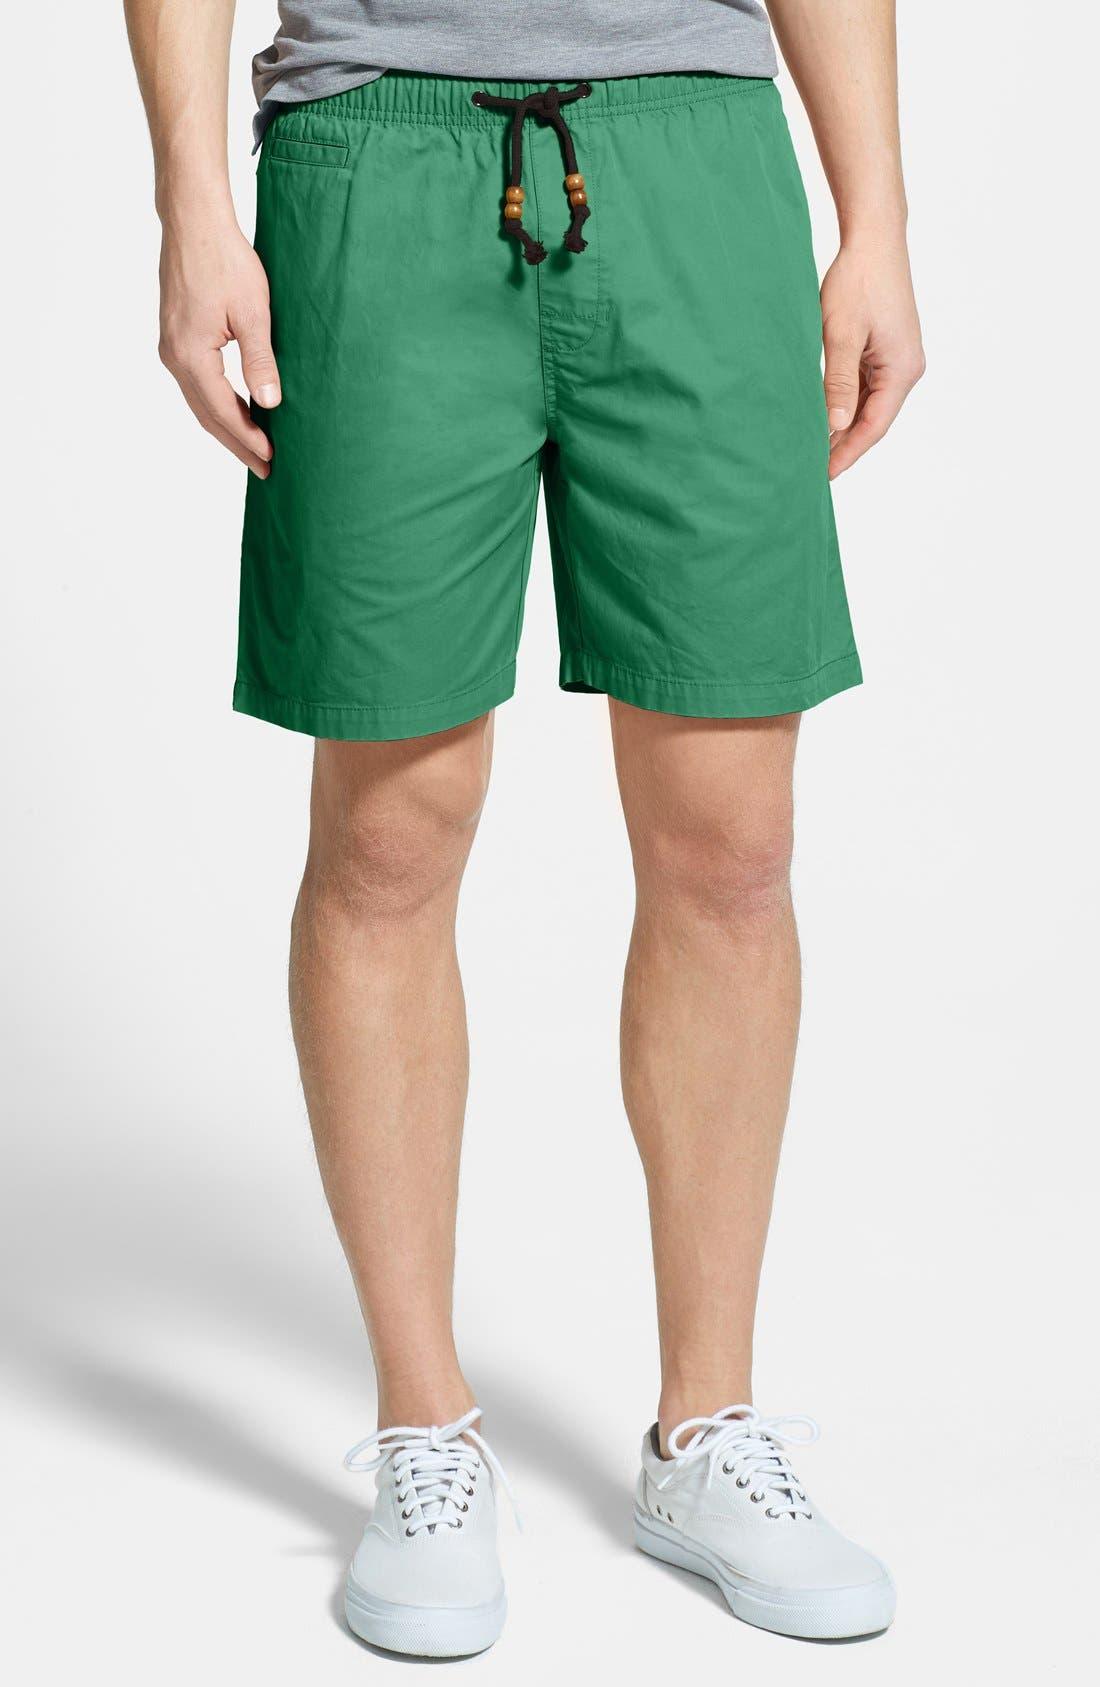 Alternate Image 1 Selected - Vintage 1946 'Sahara' Vintage Washed Twill Shorts